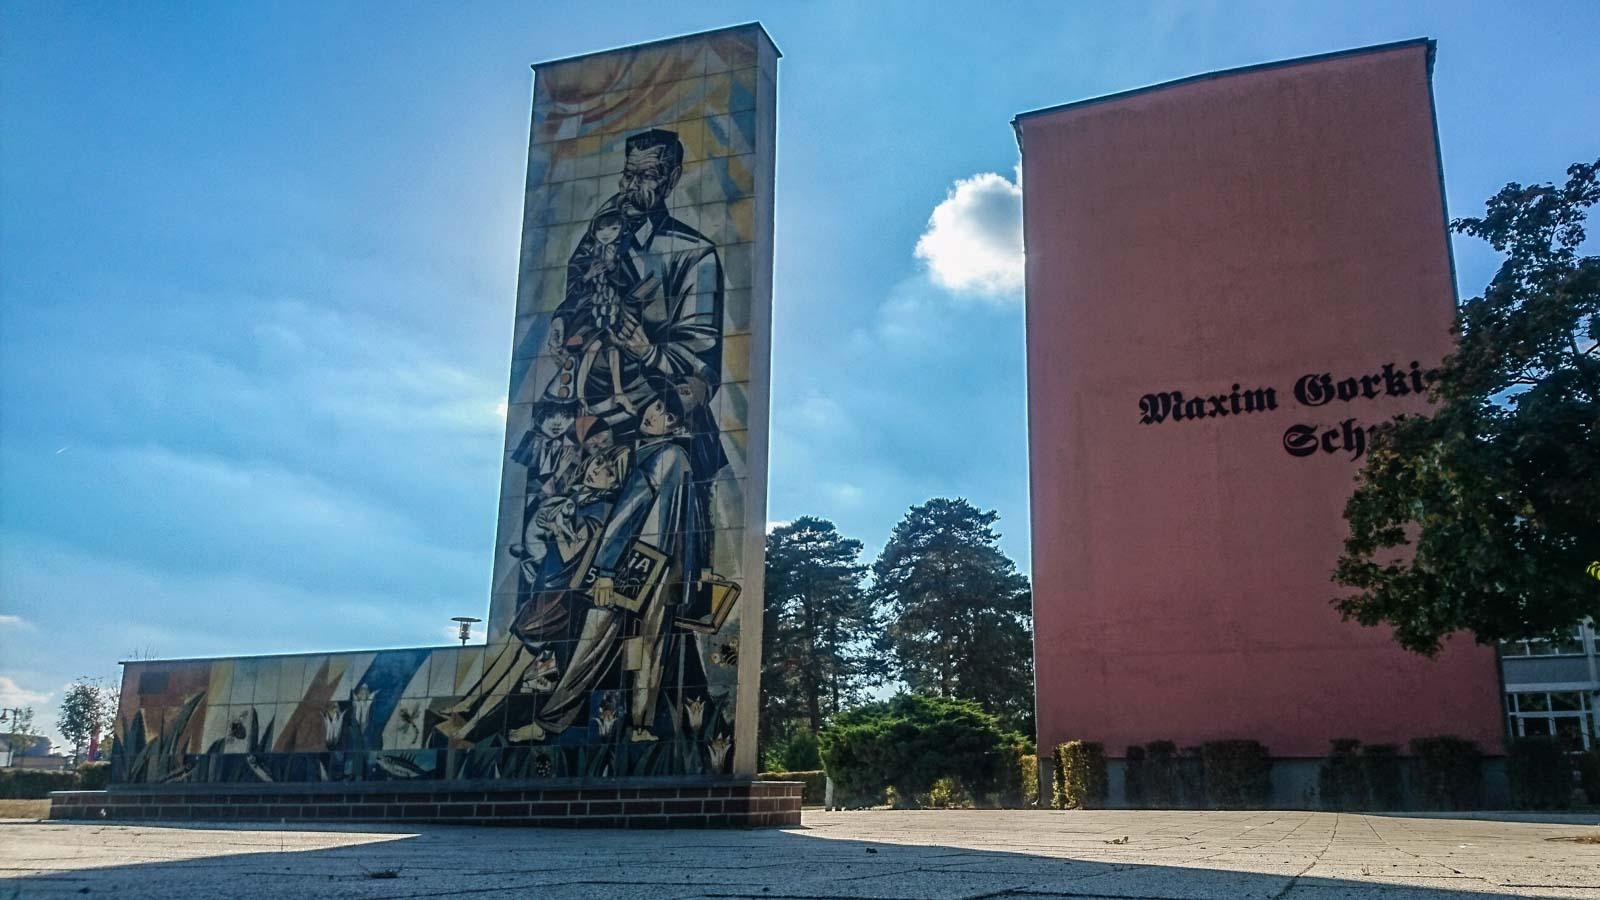 Maxim Gorki Schule in Bad Saarow